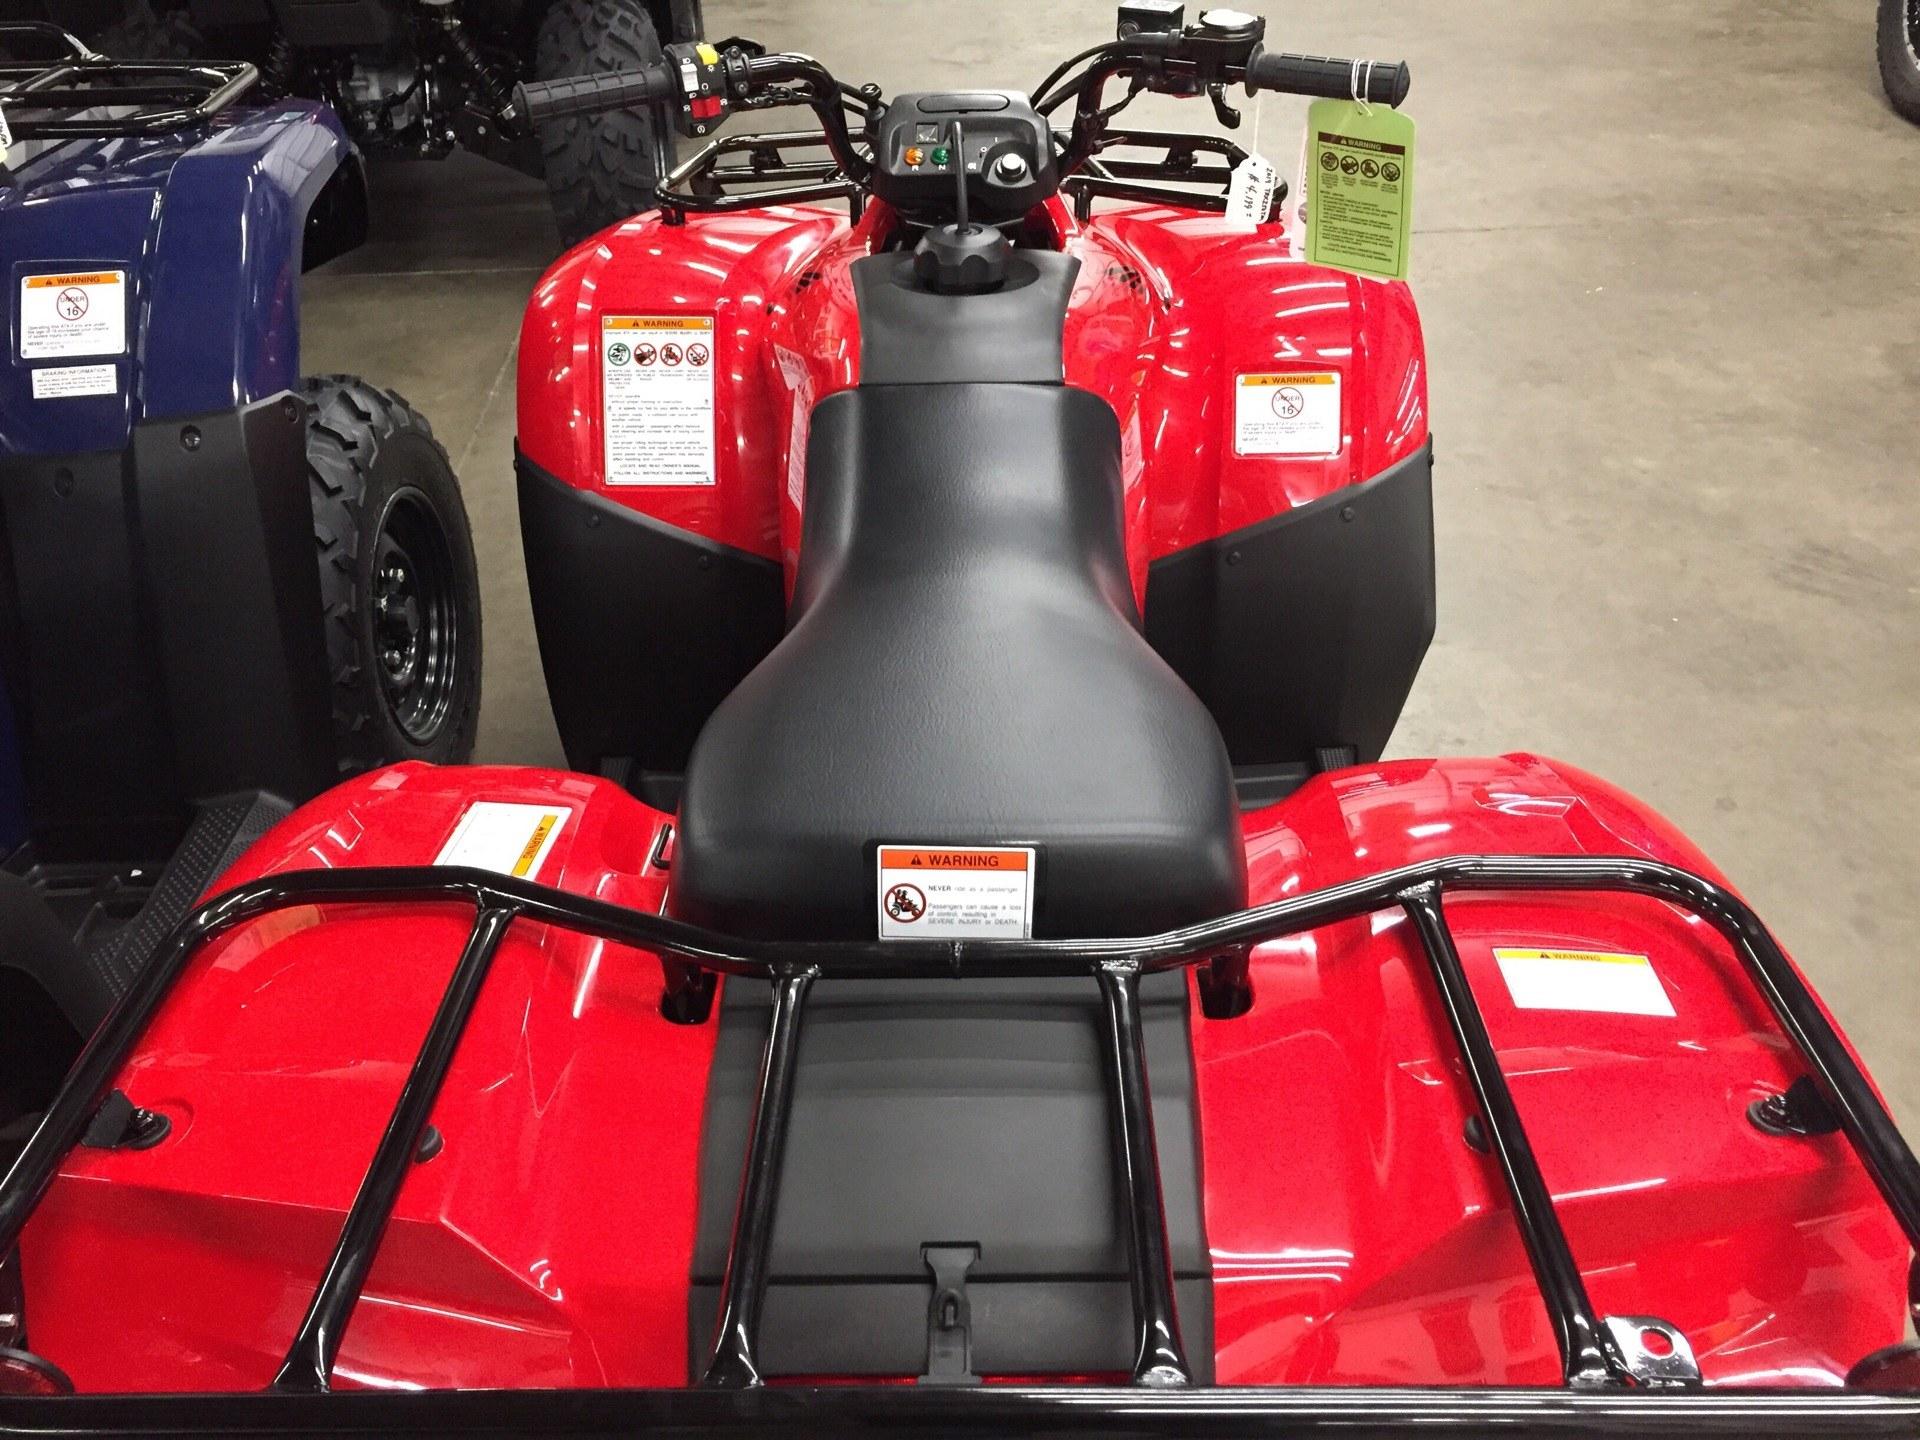 2019 Honda FourTrax Recon 5